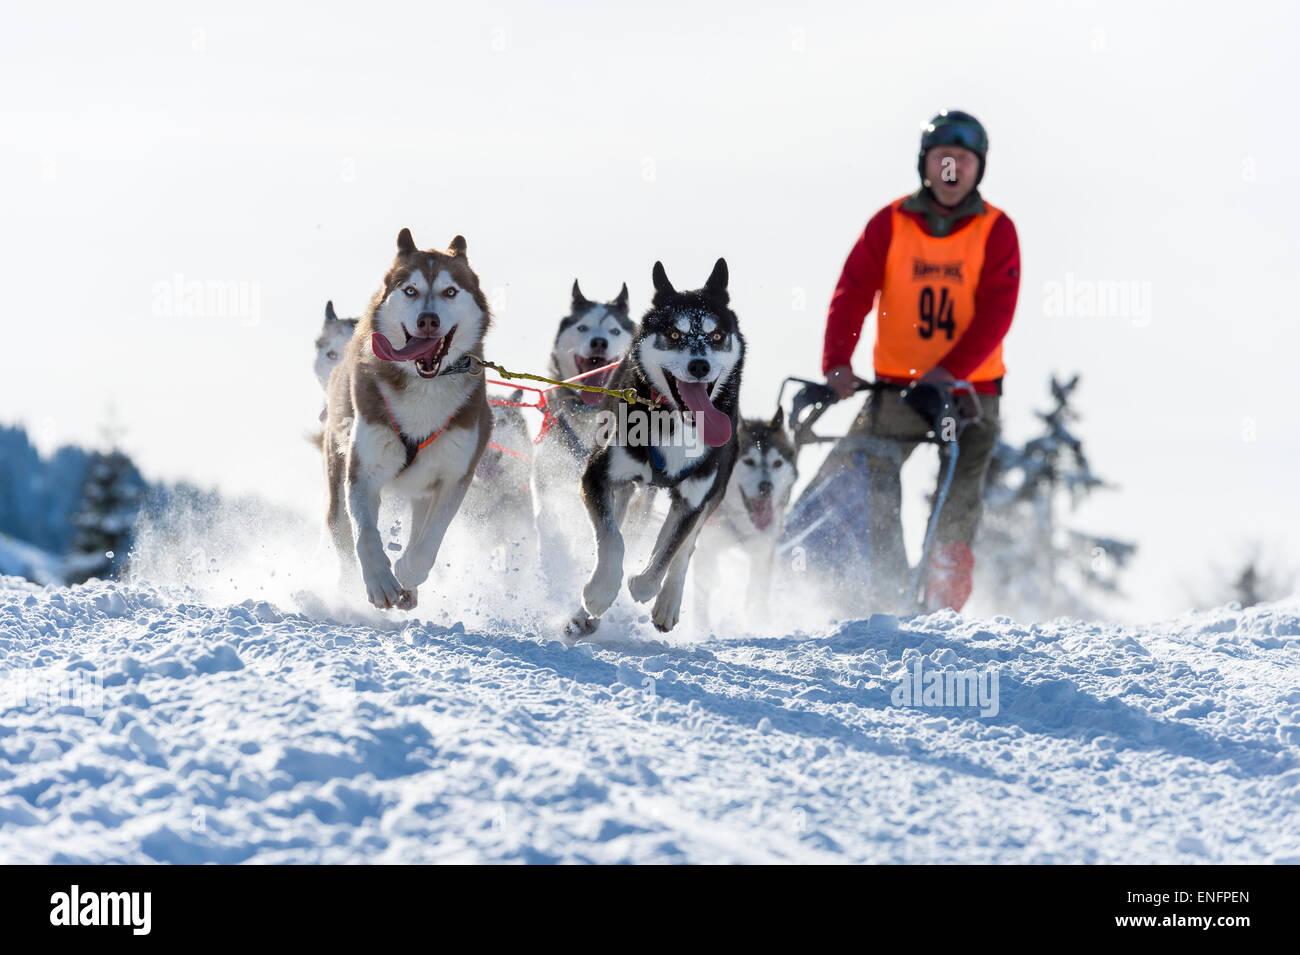 Sled dog racing, sled dog team in winter landscape, Unterjoch, Oberallgäu, Bavaria, Germany - Stock Image